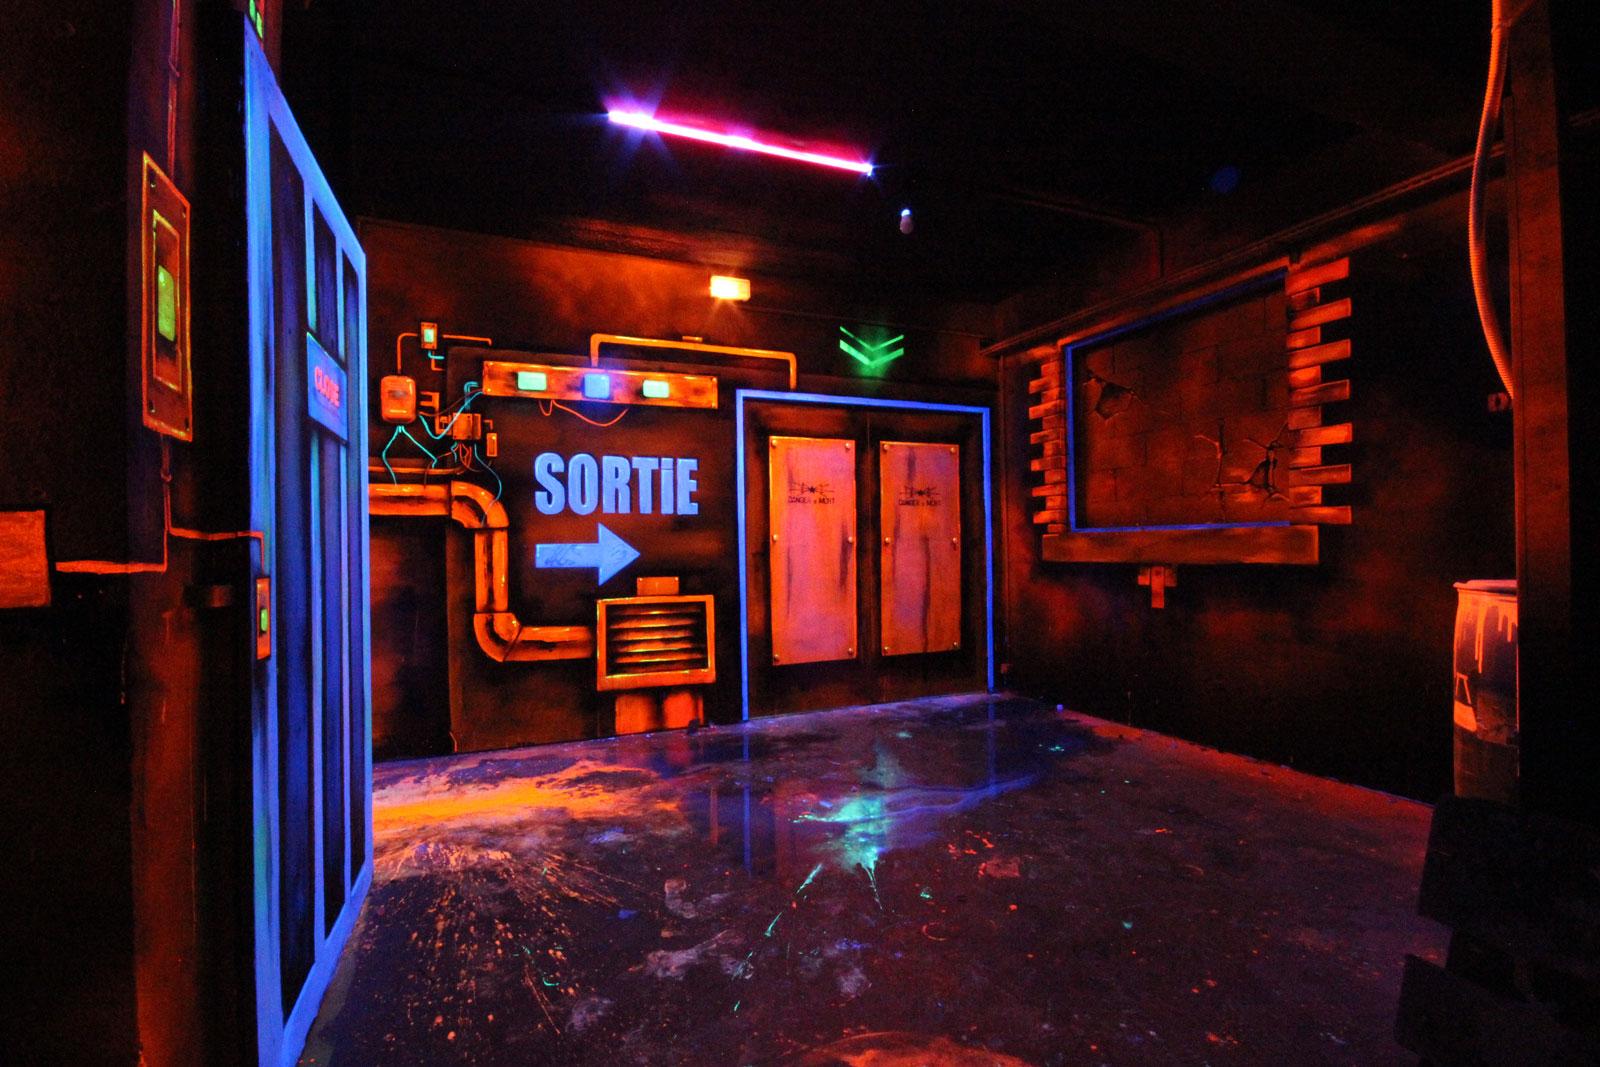 La salle de Laser Game de la Funky Factory - image 10